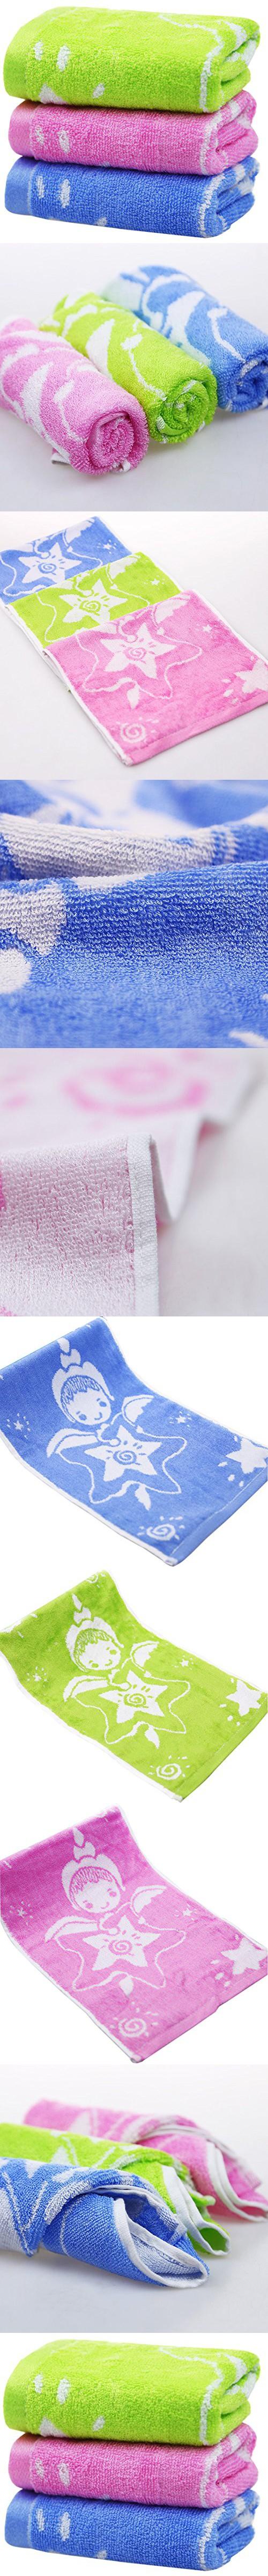 Moolecole Bamboo Fiber Baby Washcloths & Wipes Baby Lovely Angel ...